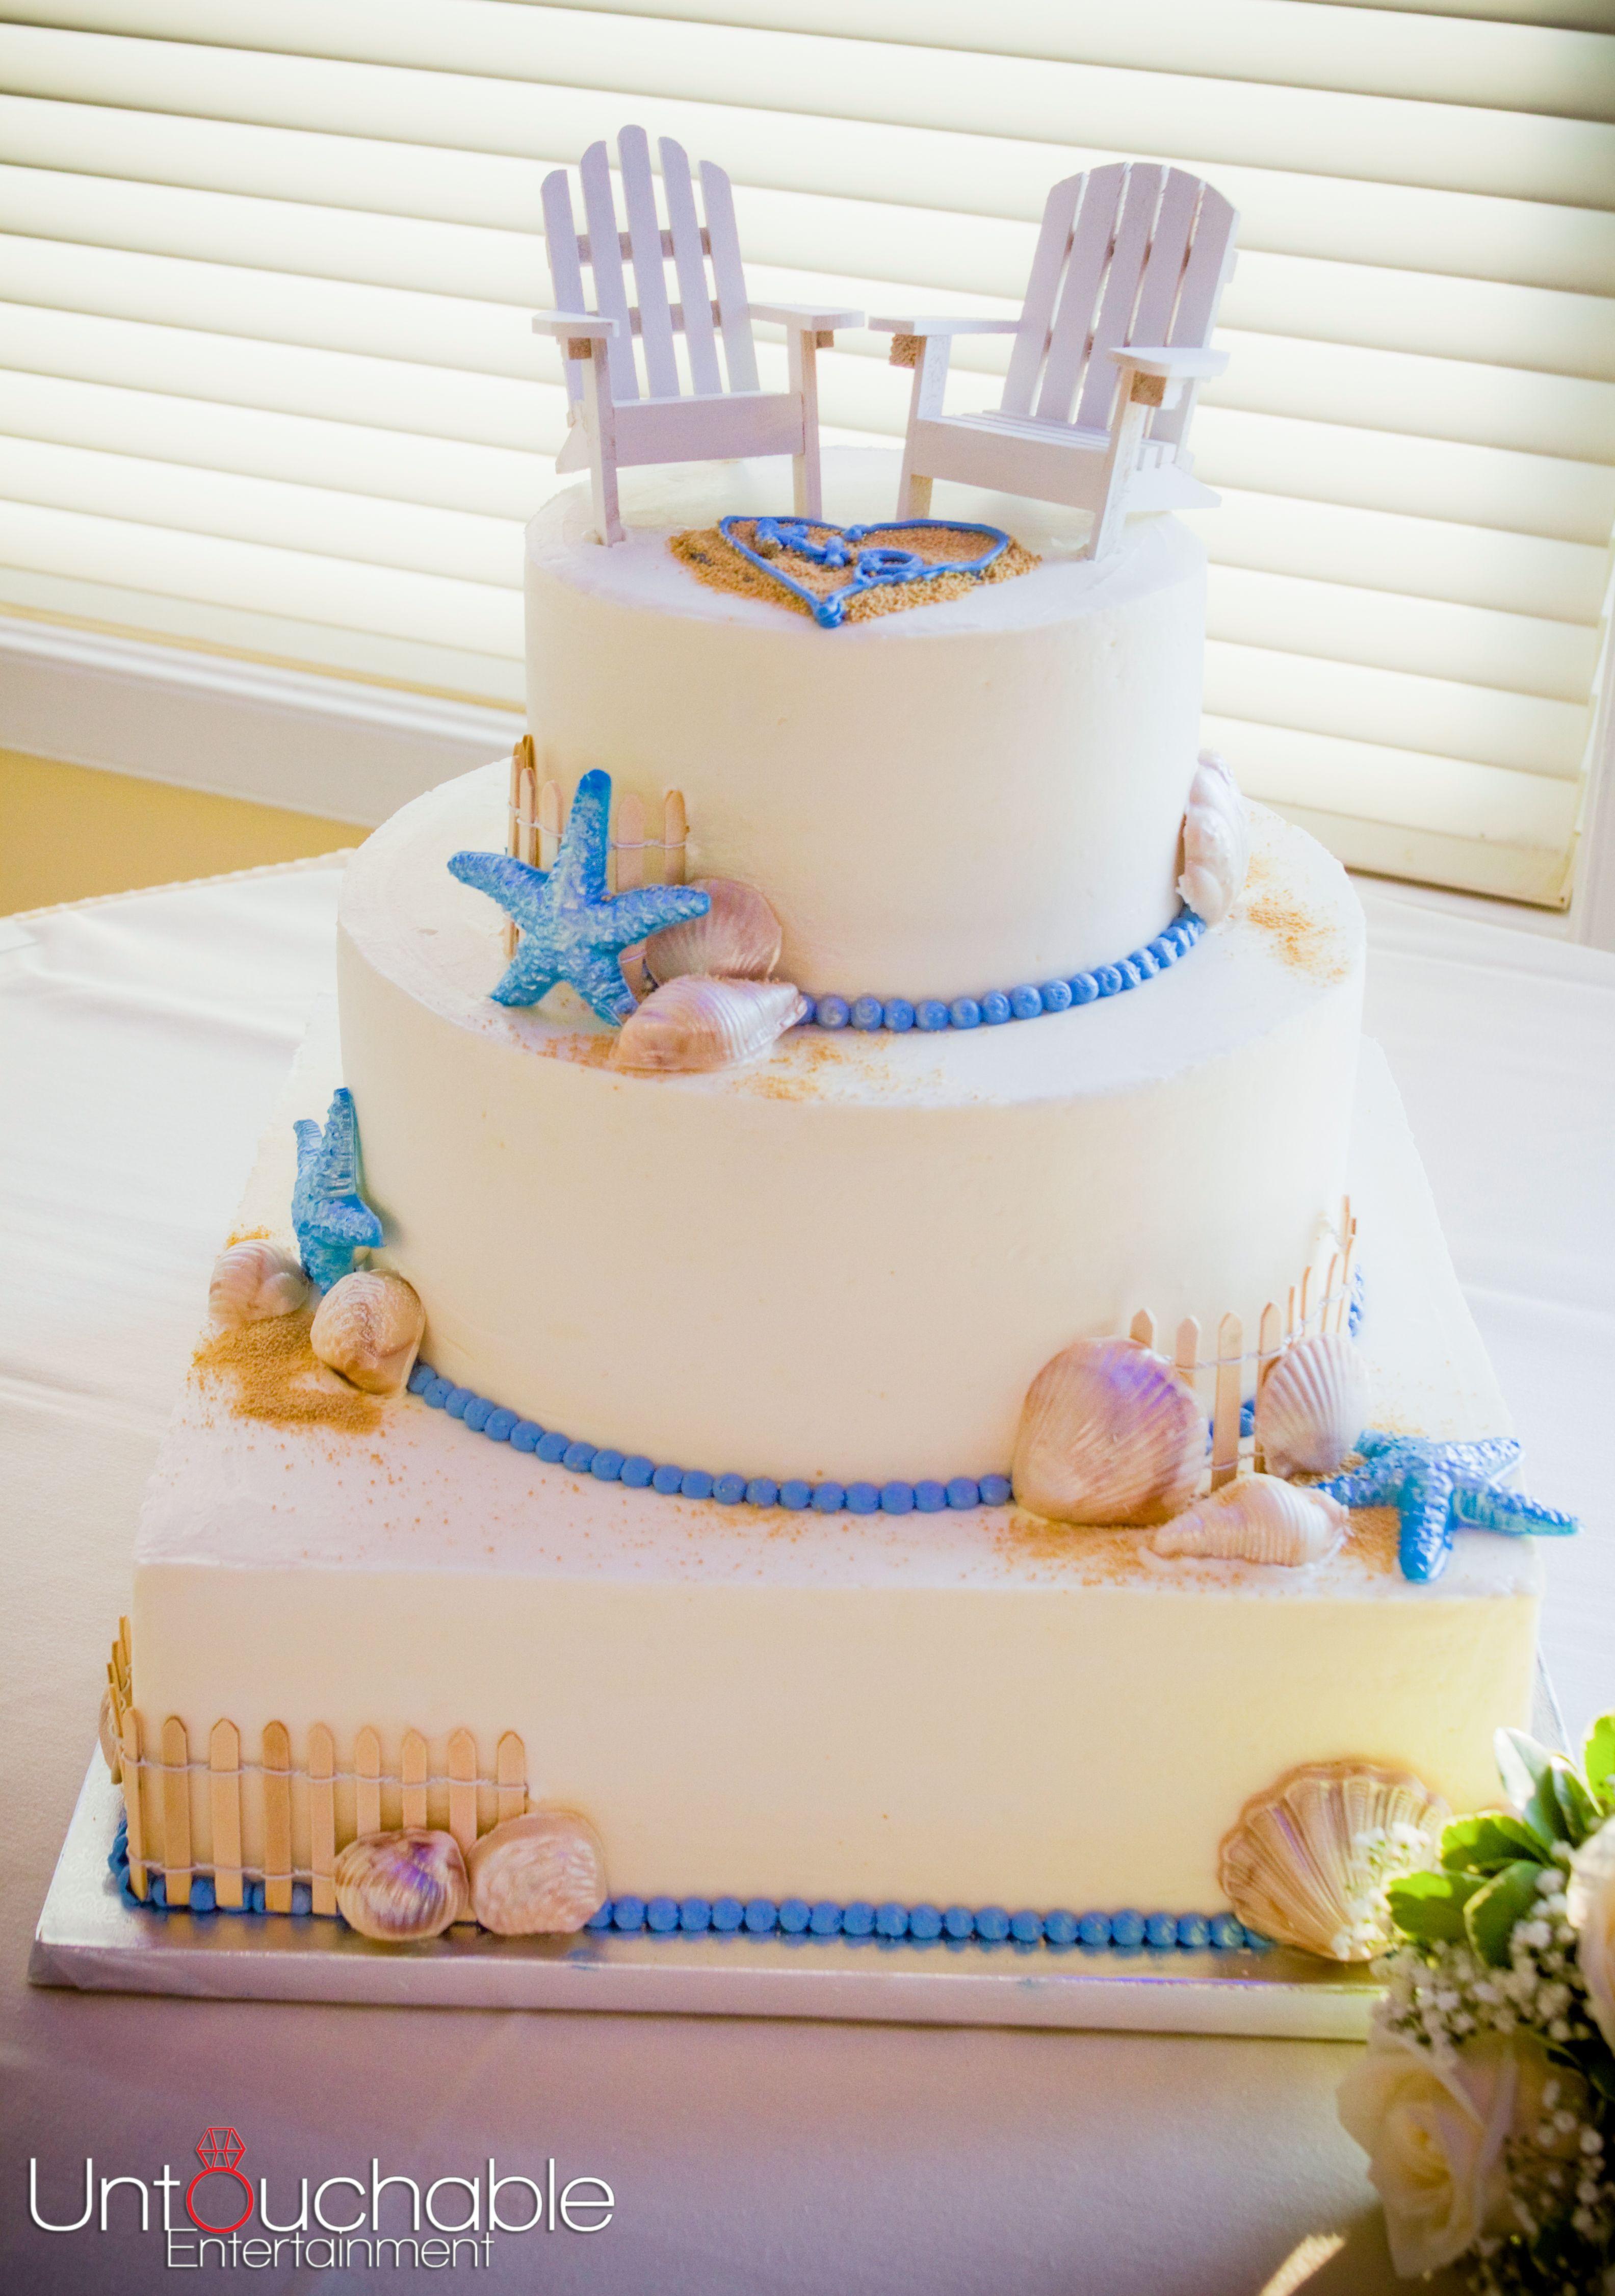 Beach Themed Wedding Cake The Beach Chair Cake Topper Is So